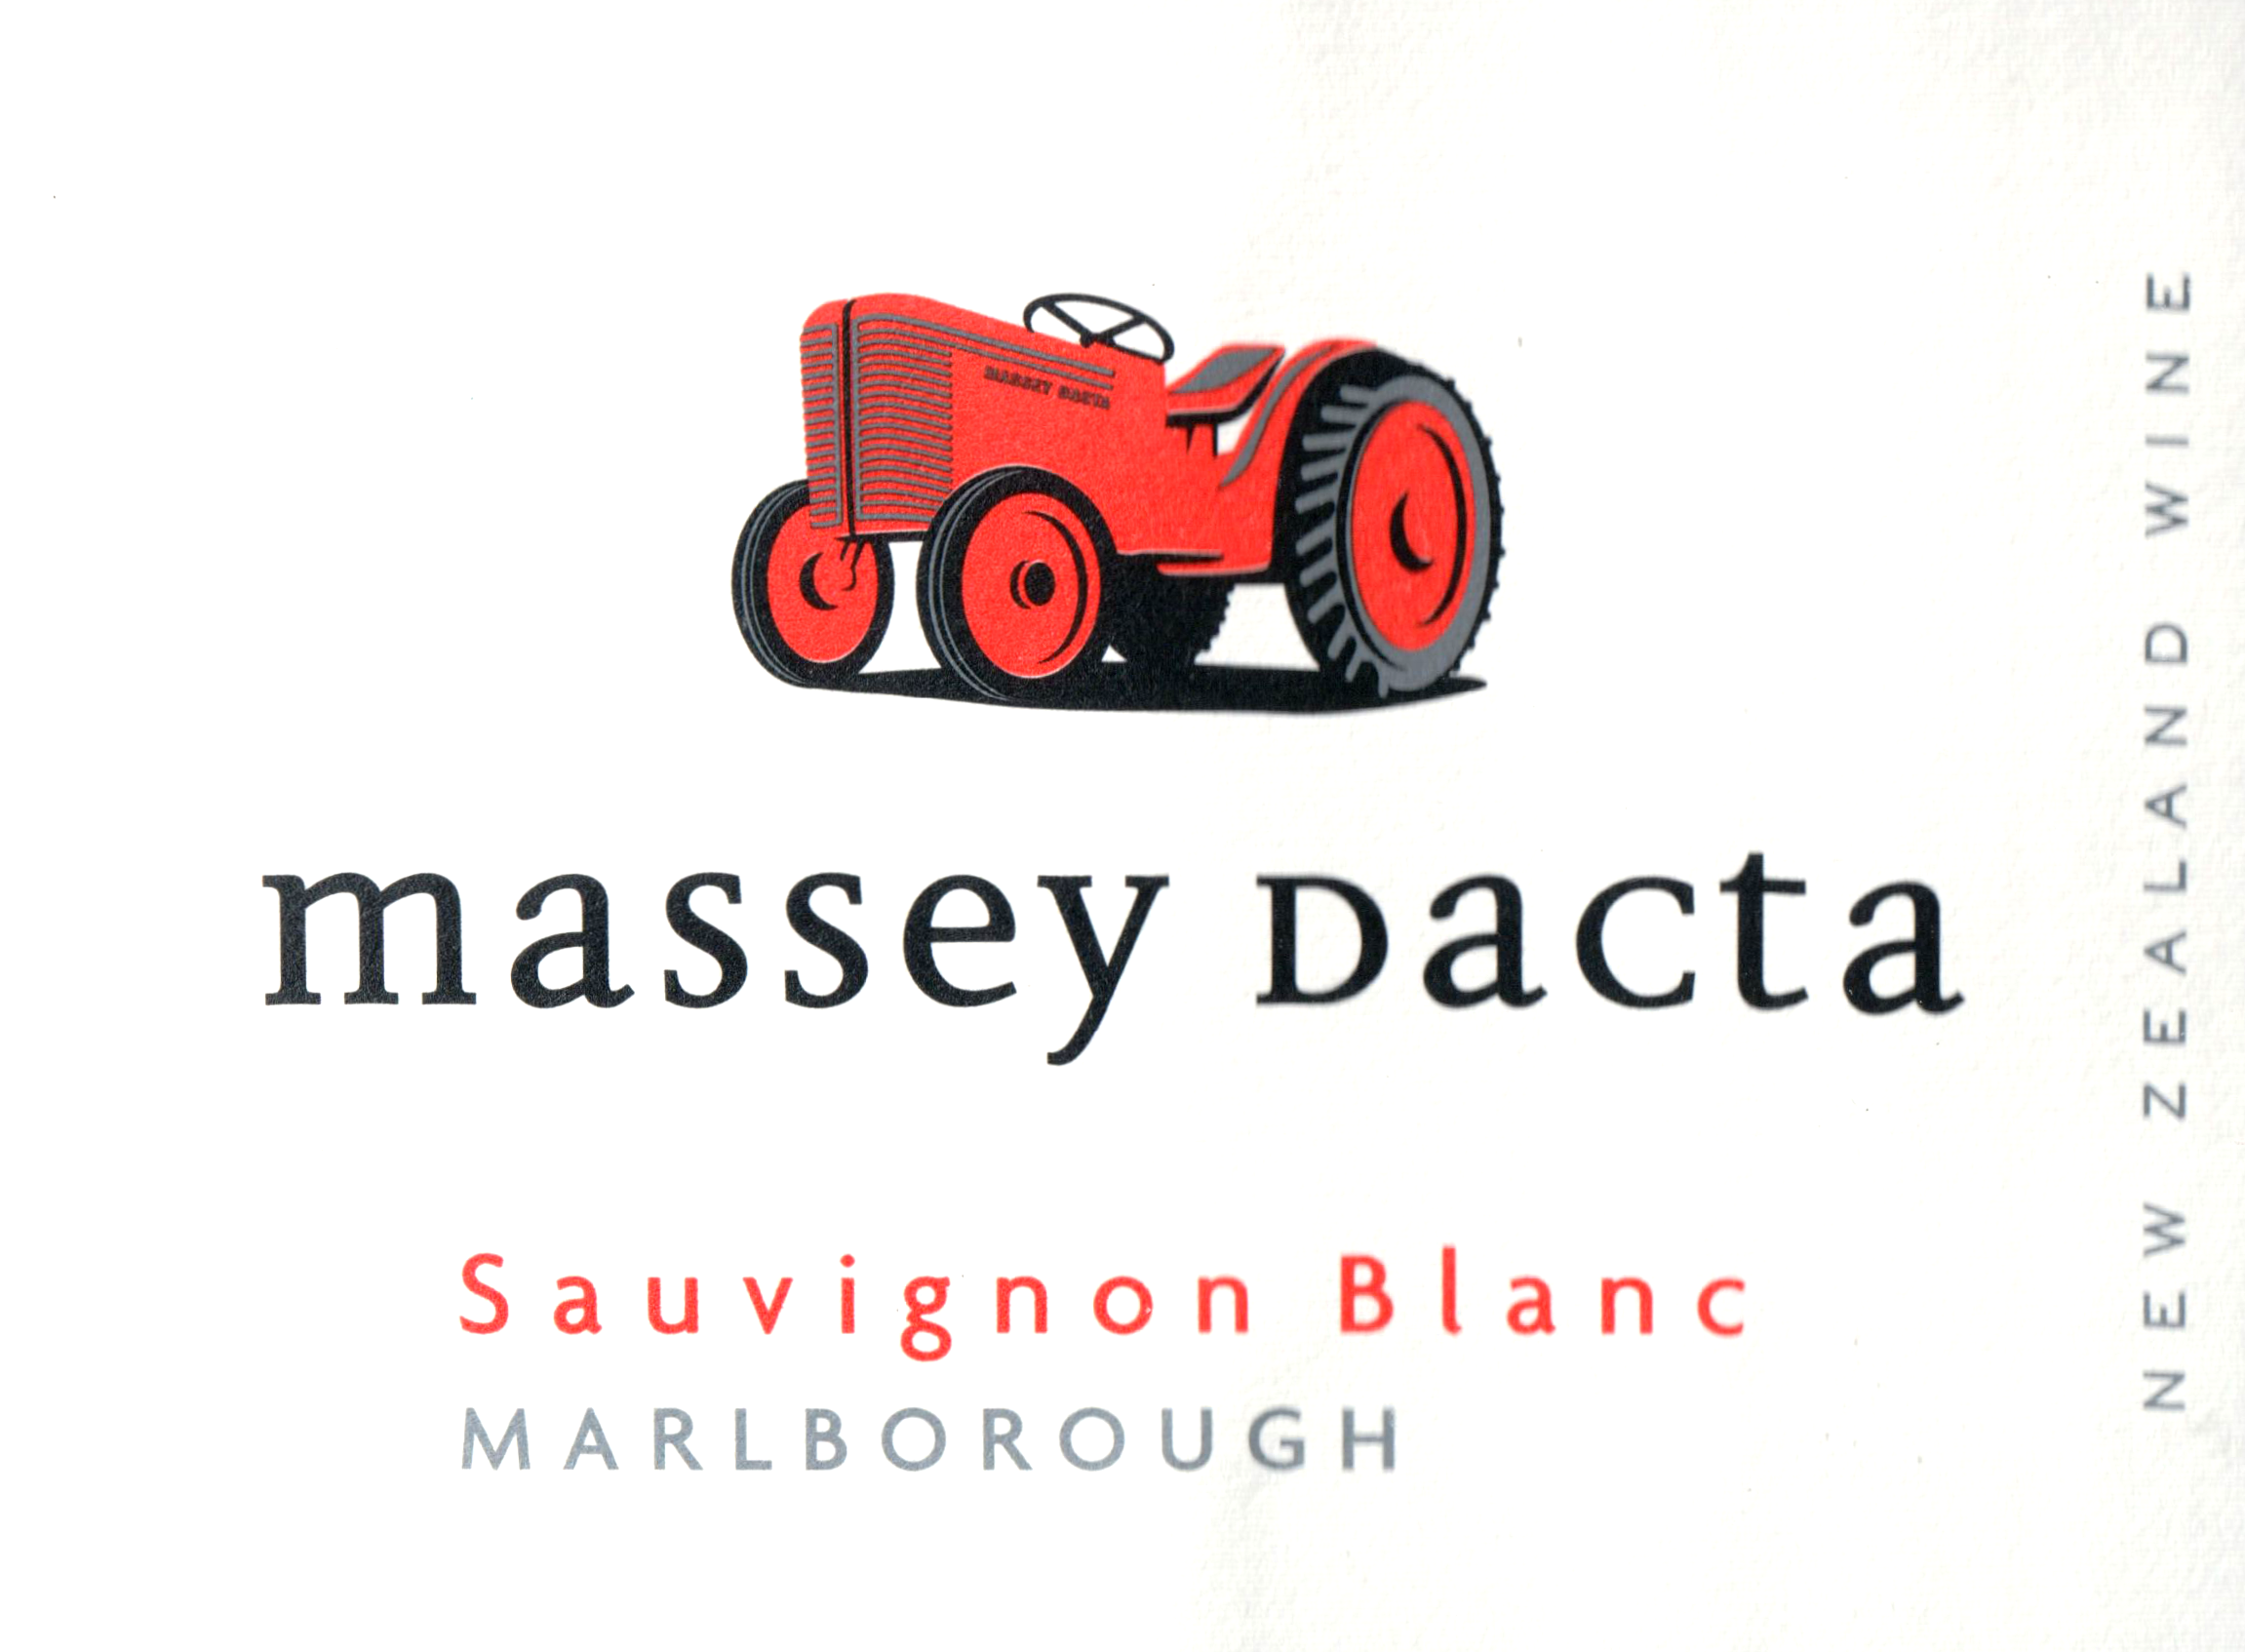 Massey Dacta Sauvignon Blanc 2019